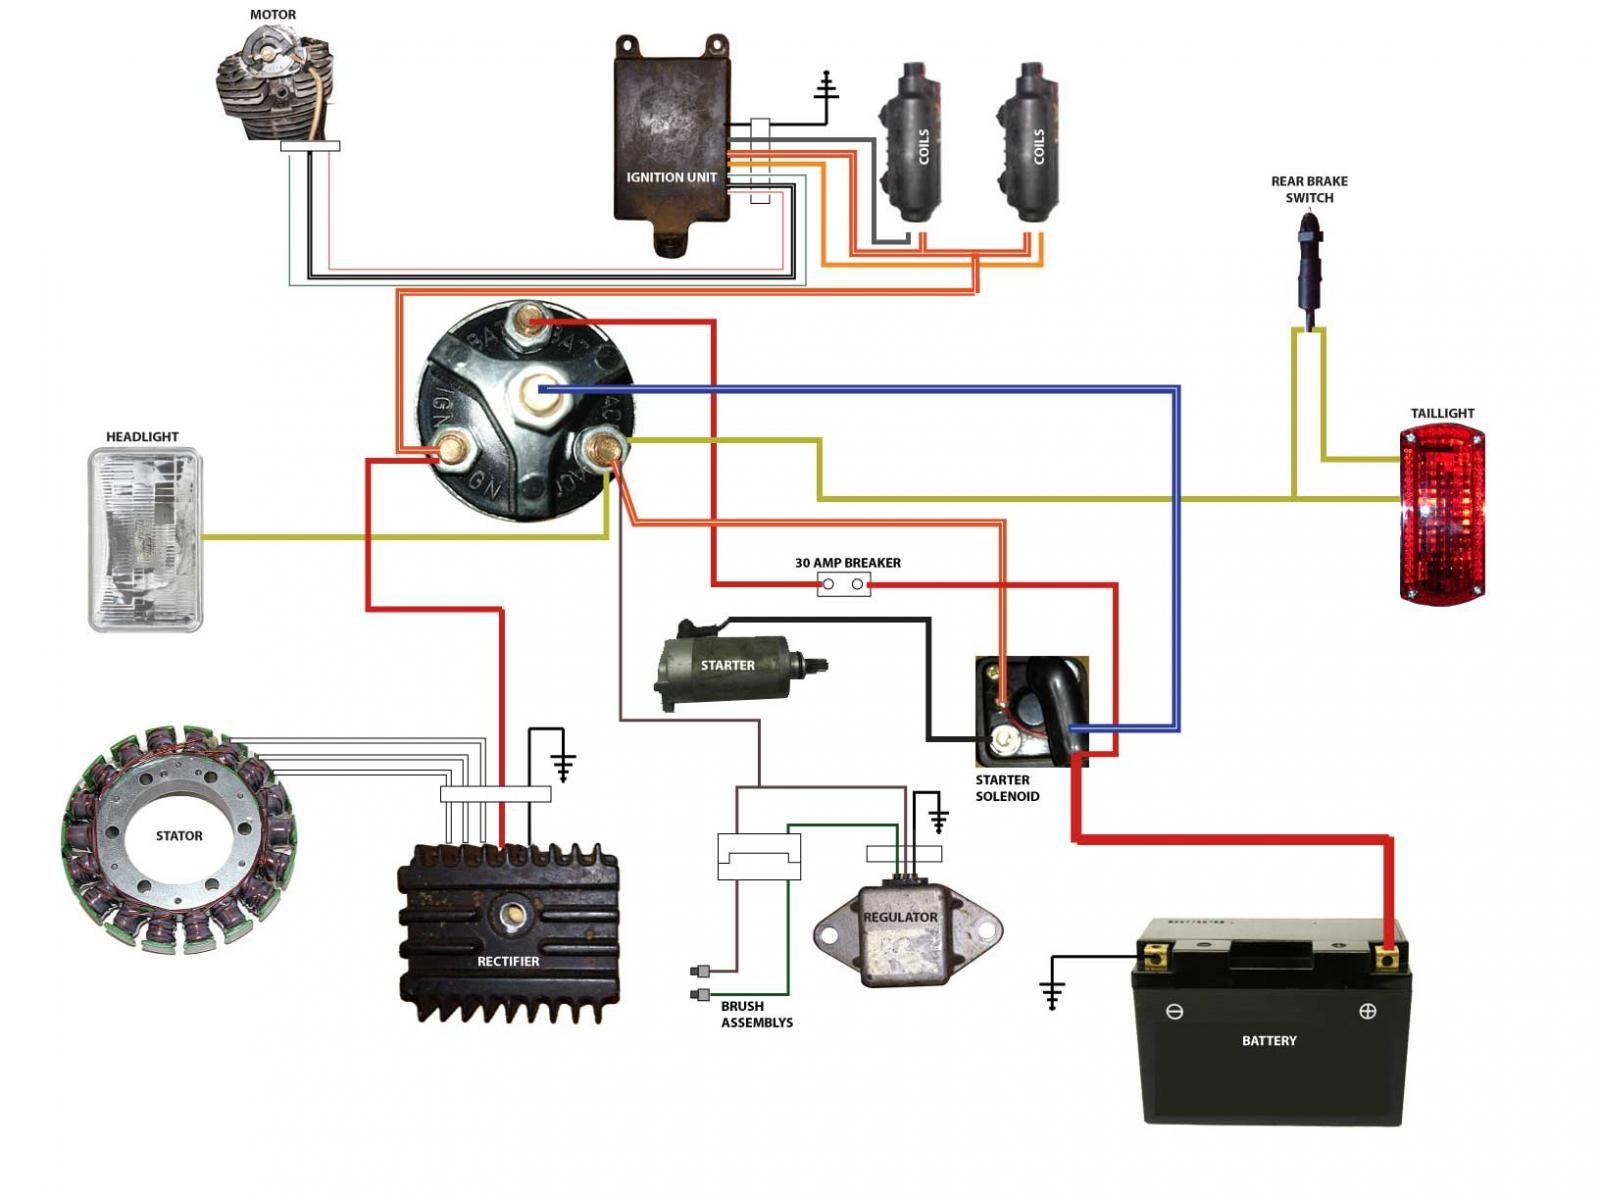 1981 yamaha virago xv750 ignition wiring diagram smart wiring rh emgsolutions co